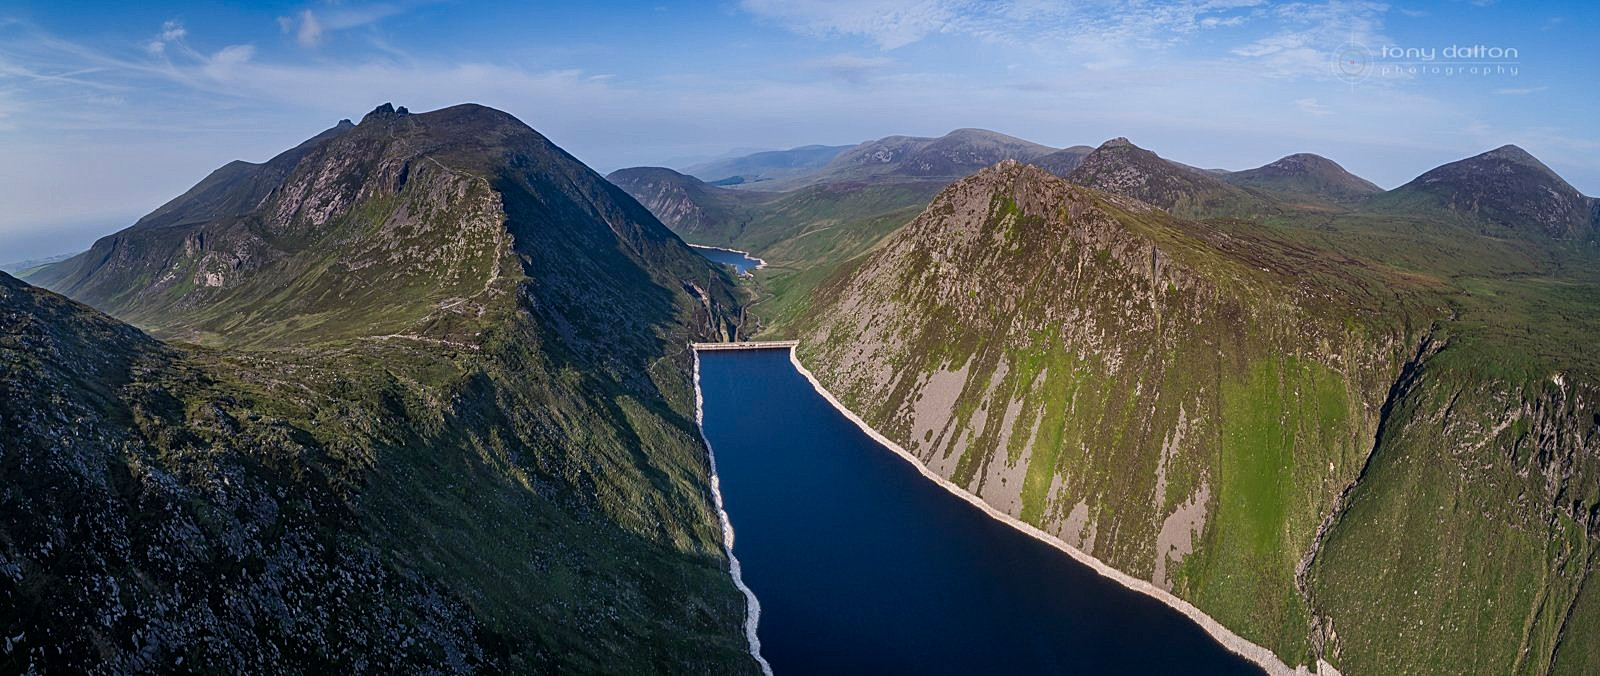 Ben Crom Reservoir, the Mournes